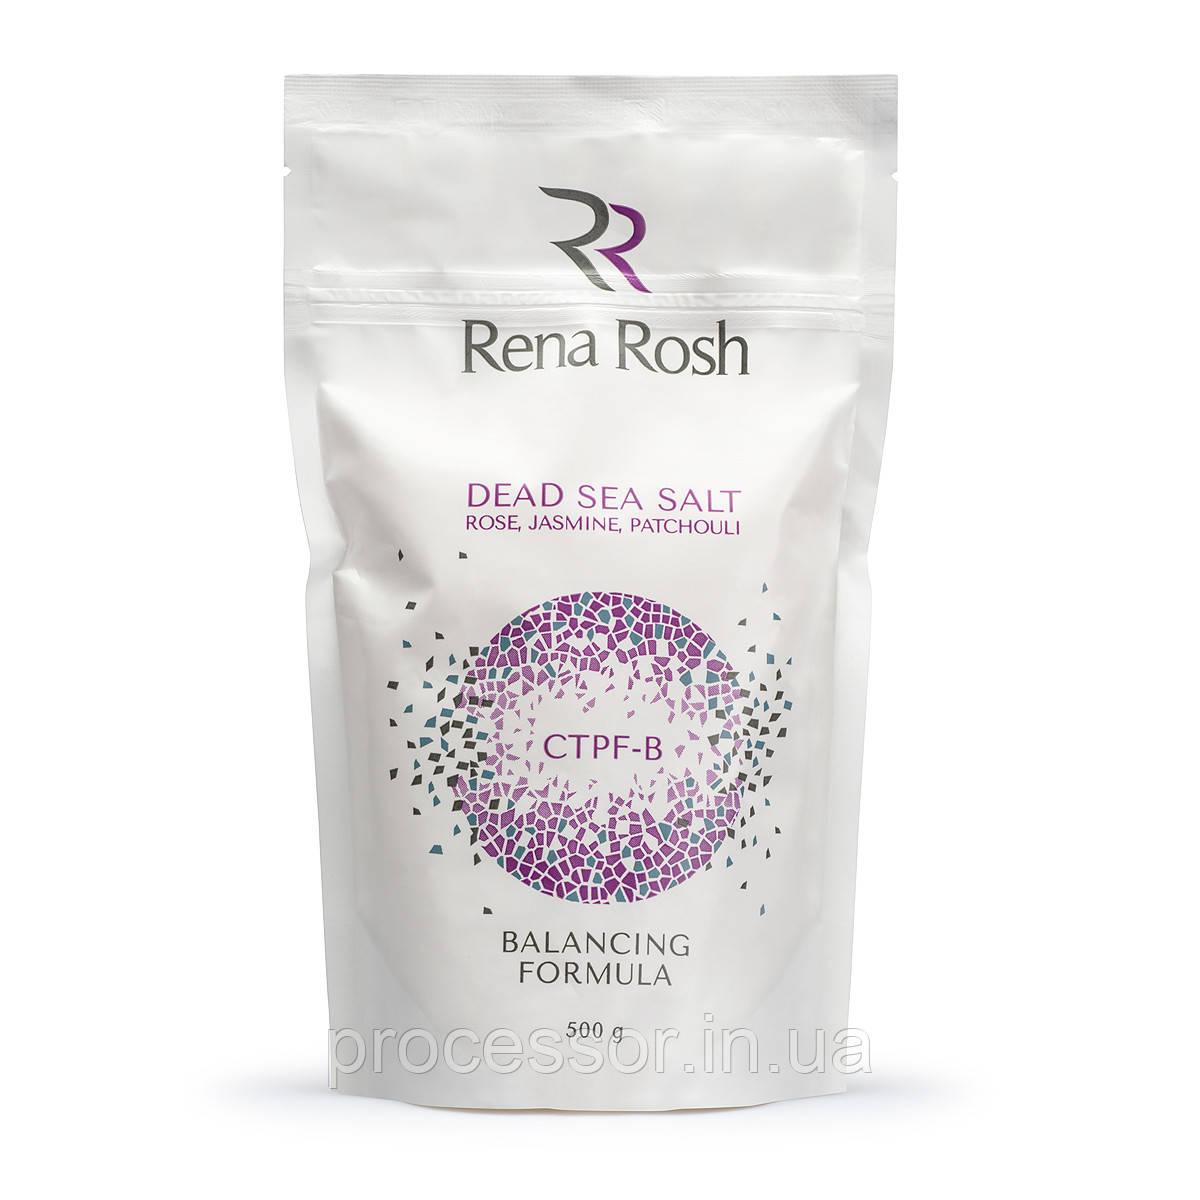 Солі мертвого моря Rena Rosh троянда, жасмин, пачулі, 500Г